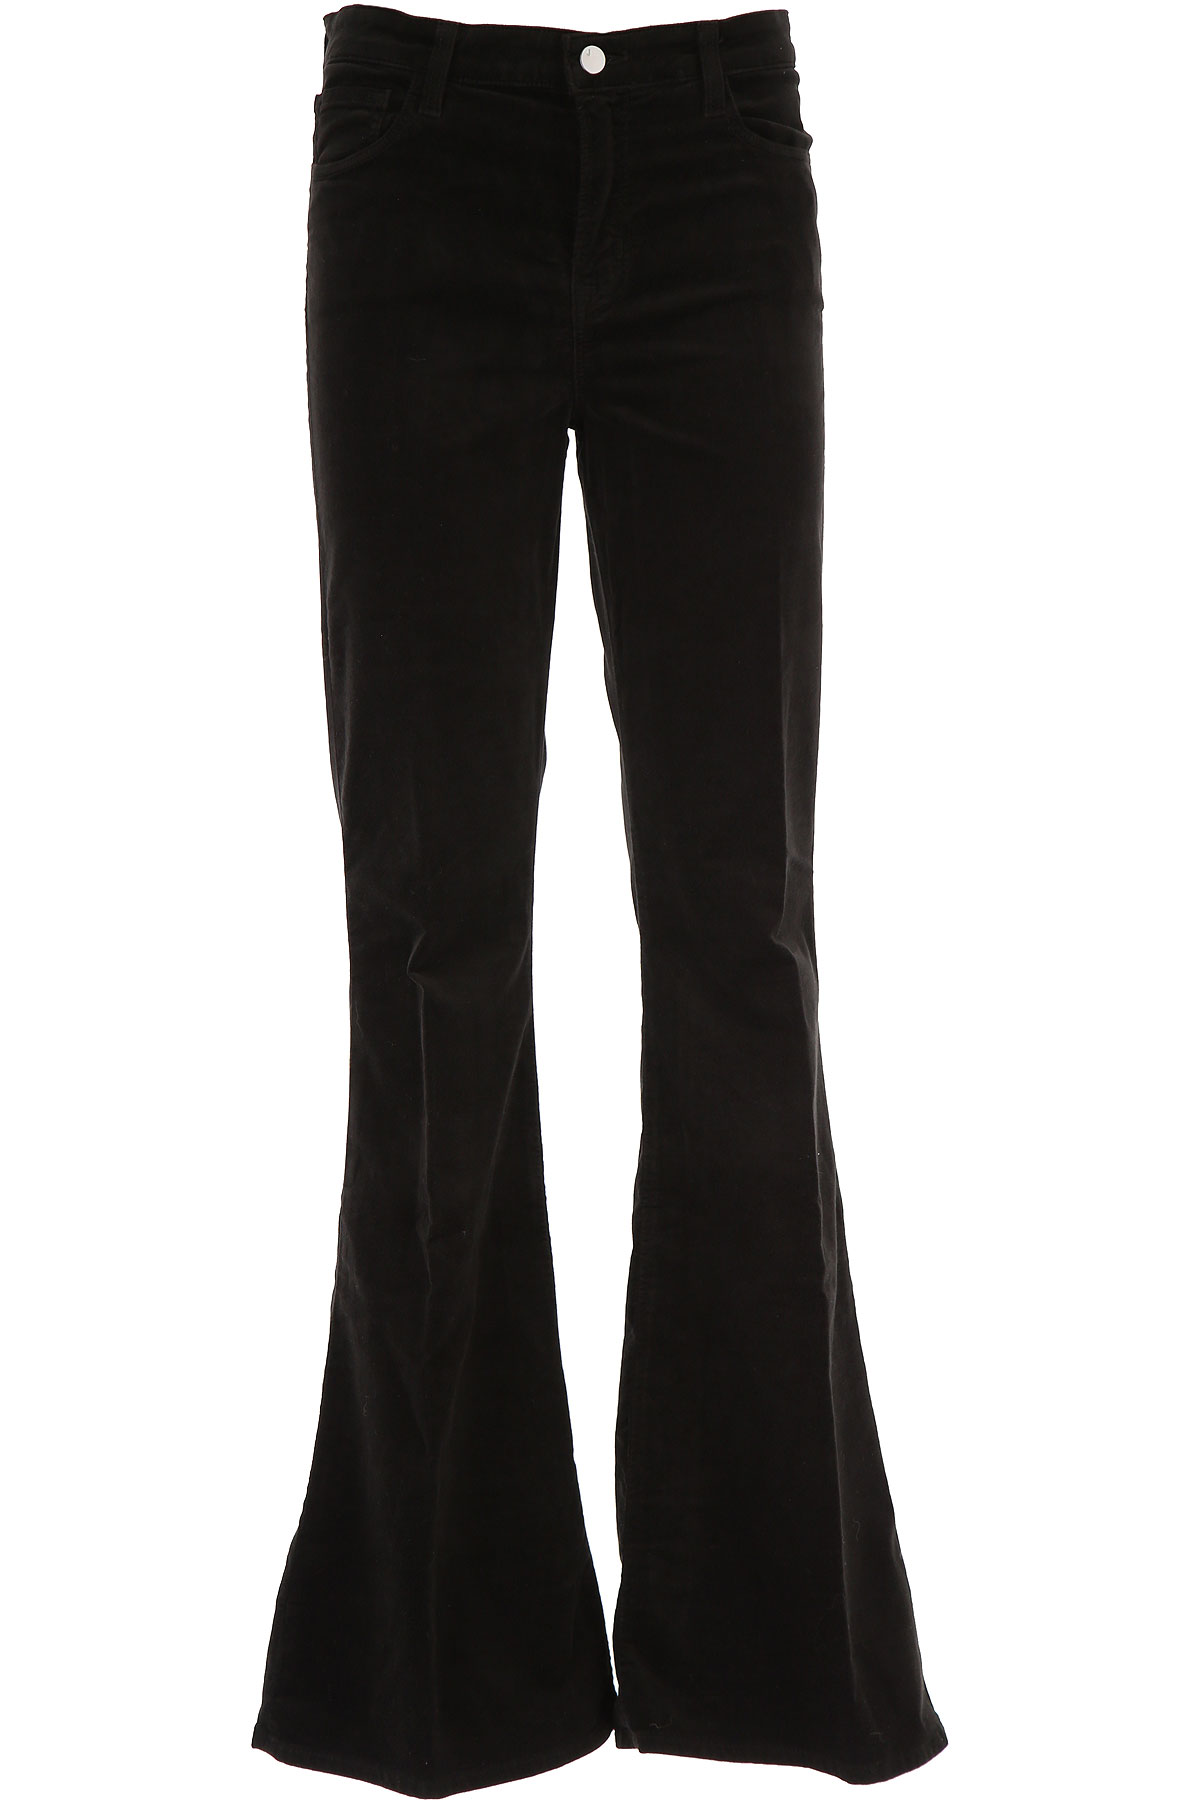 J Brand Pants for Women On Sale, Black, Cotton, 2019, 26 27 28 29